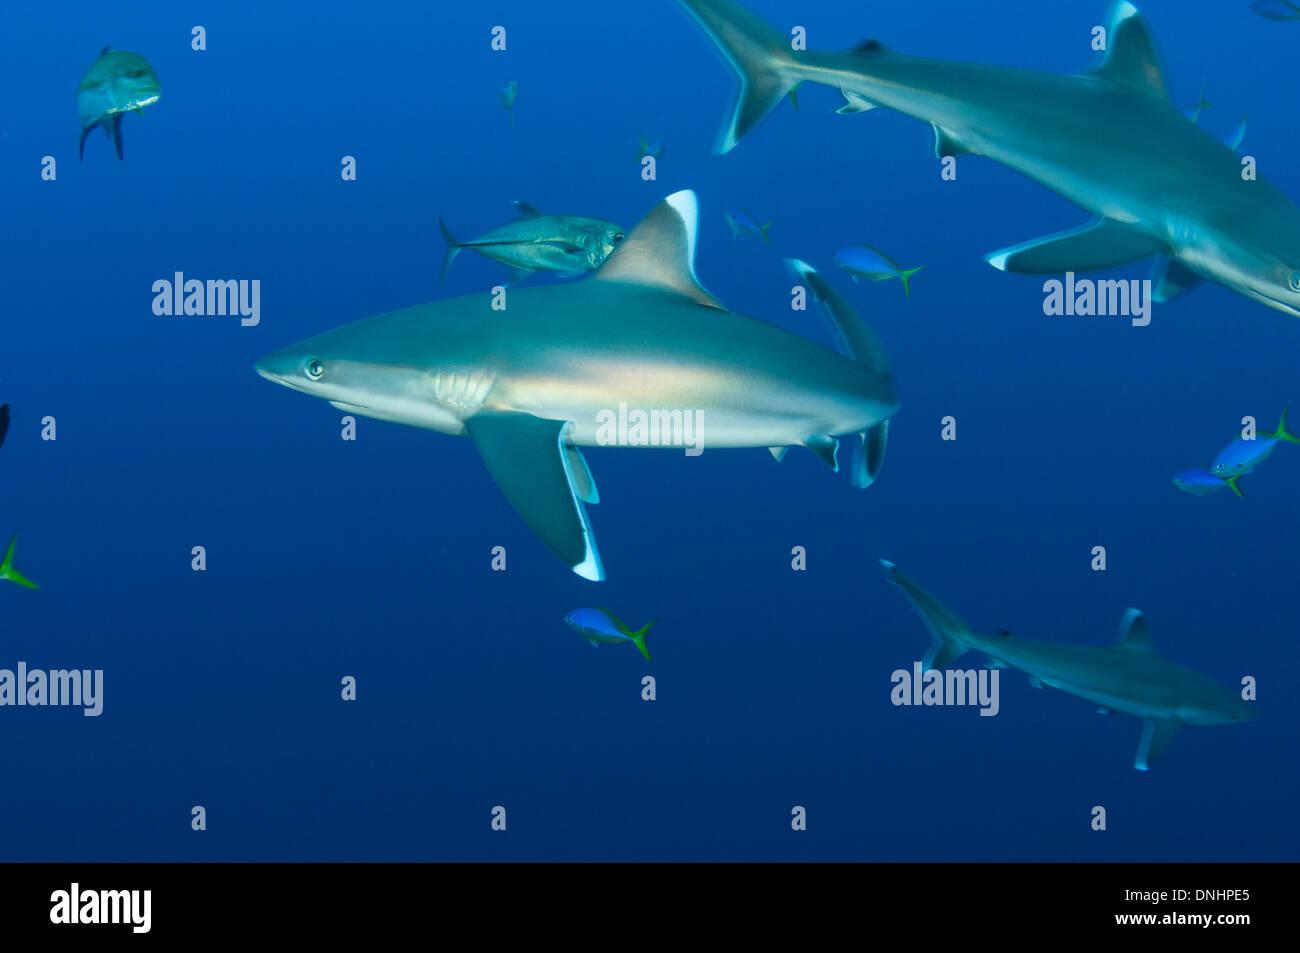 Silvertip sharks - Stock Image